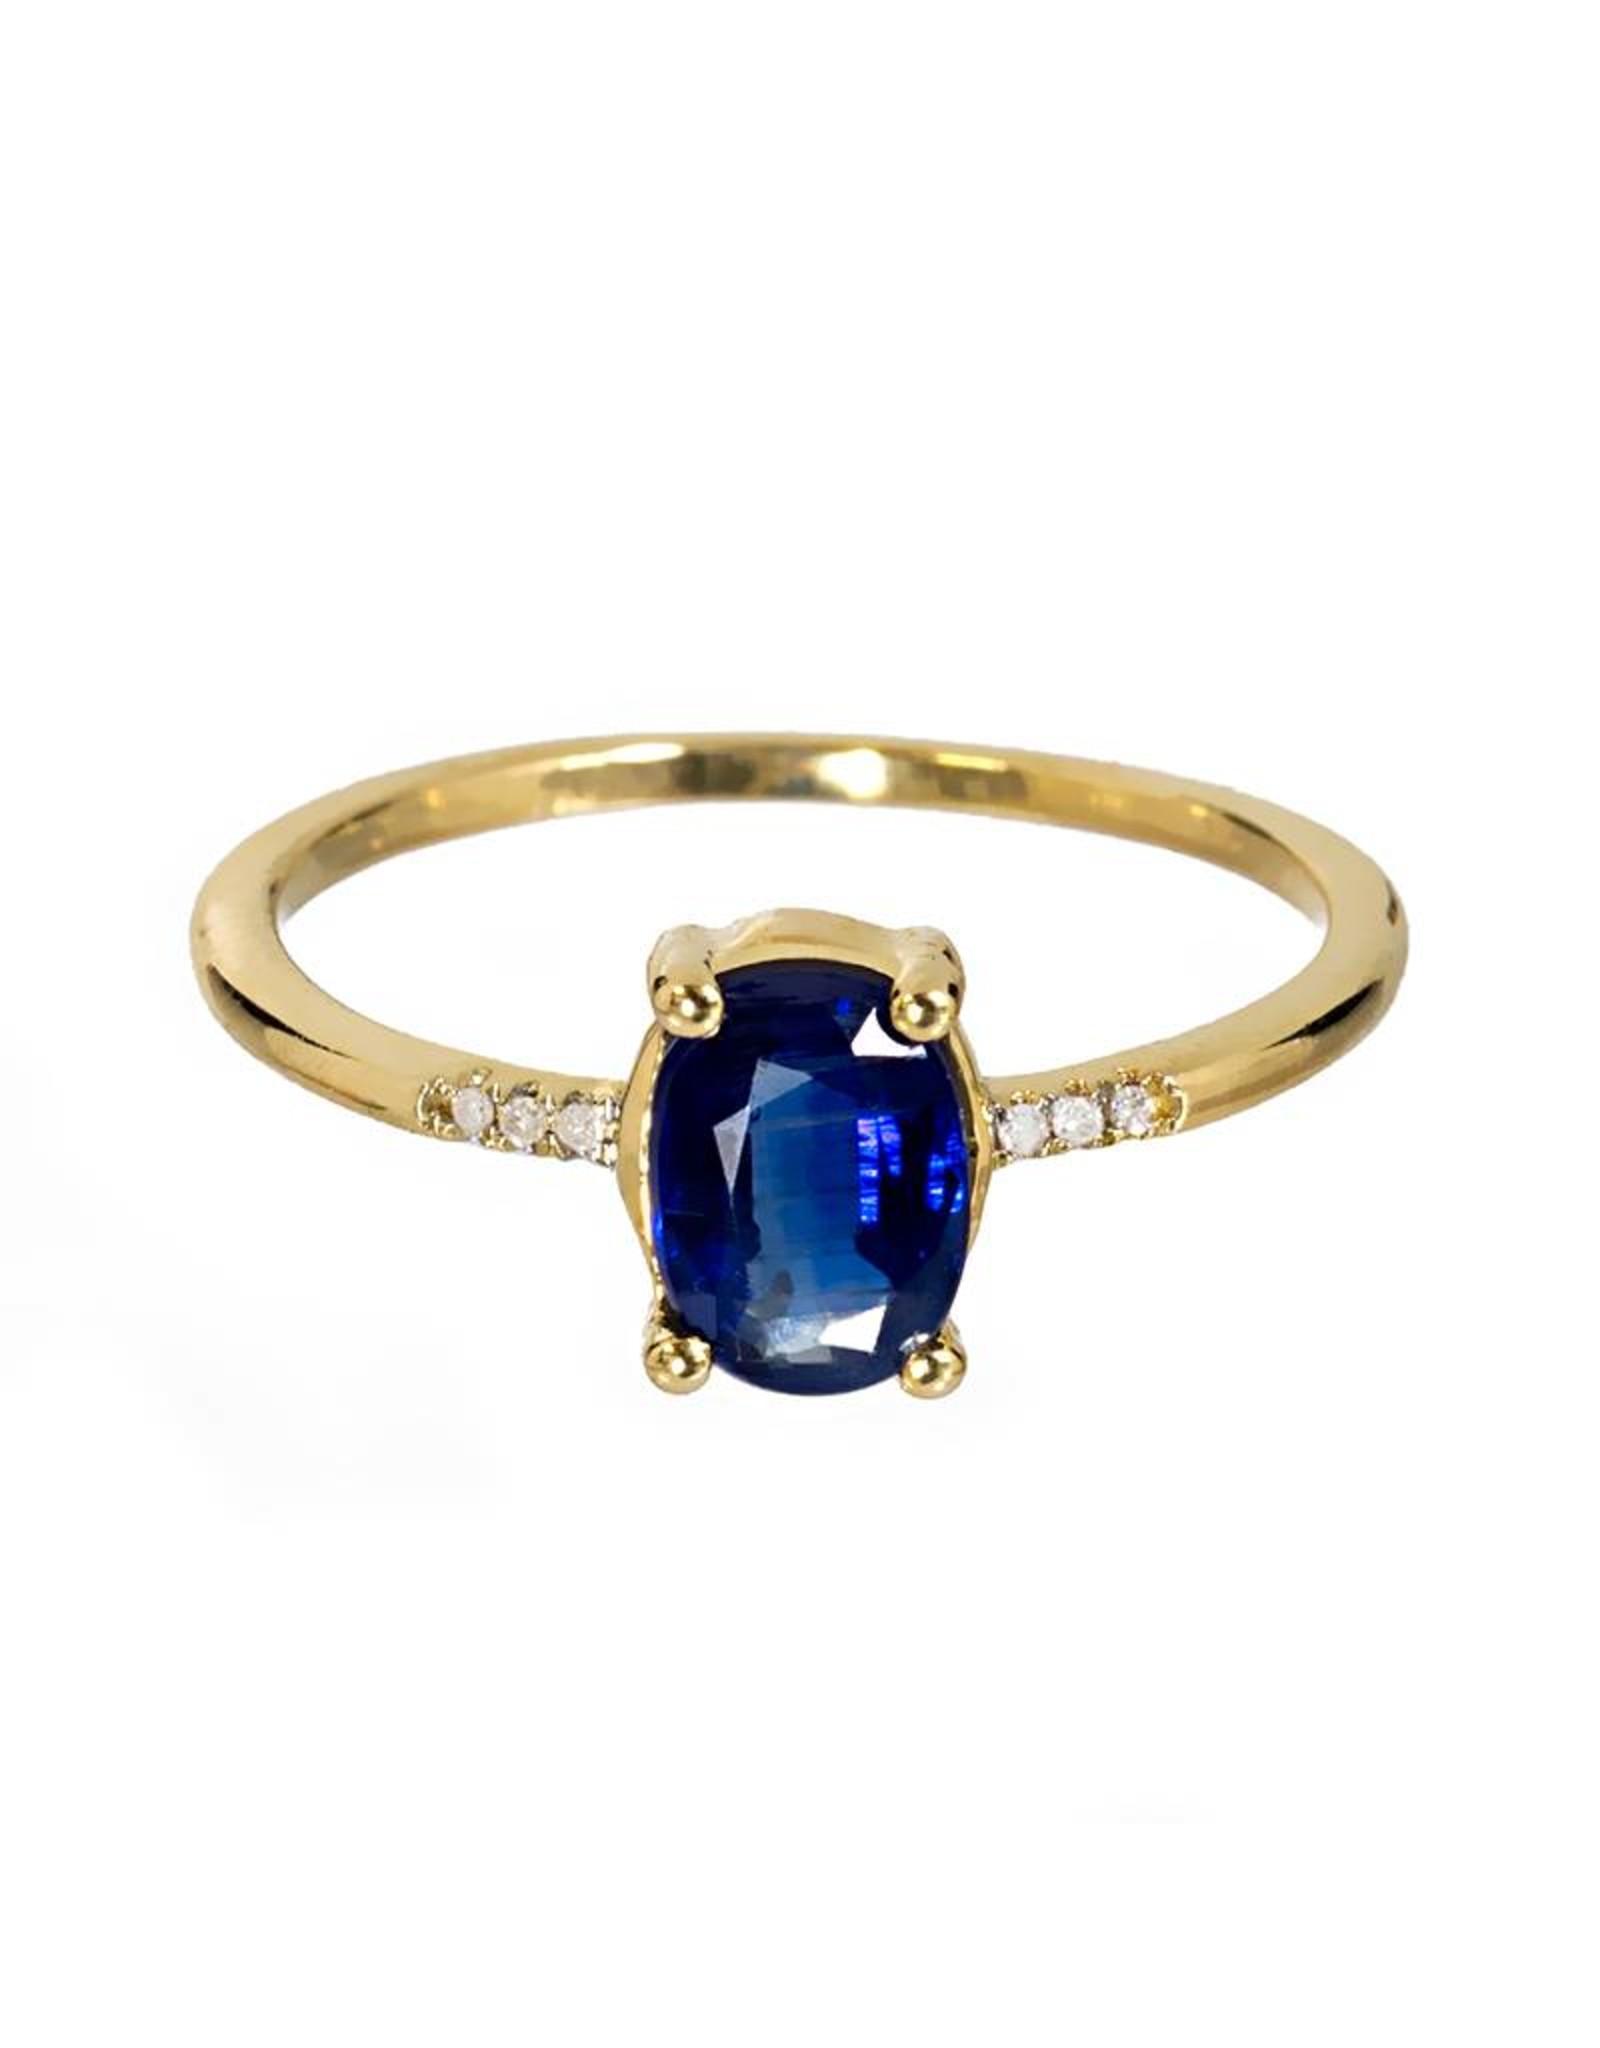 Bo Gold Ring - Gold - Kyanite - Diamond